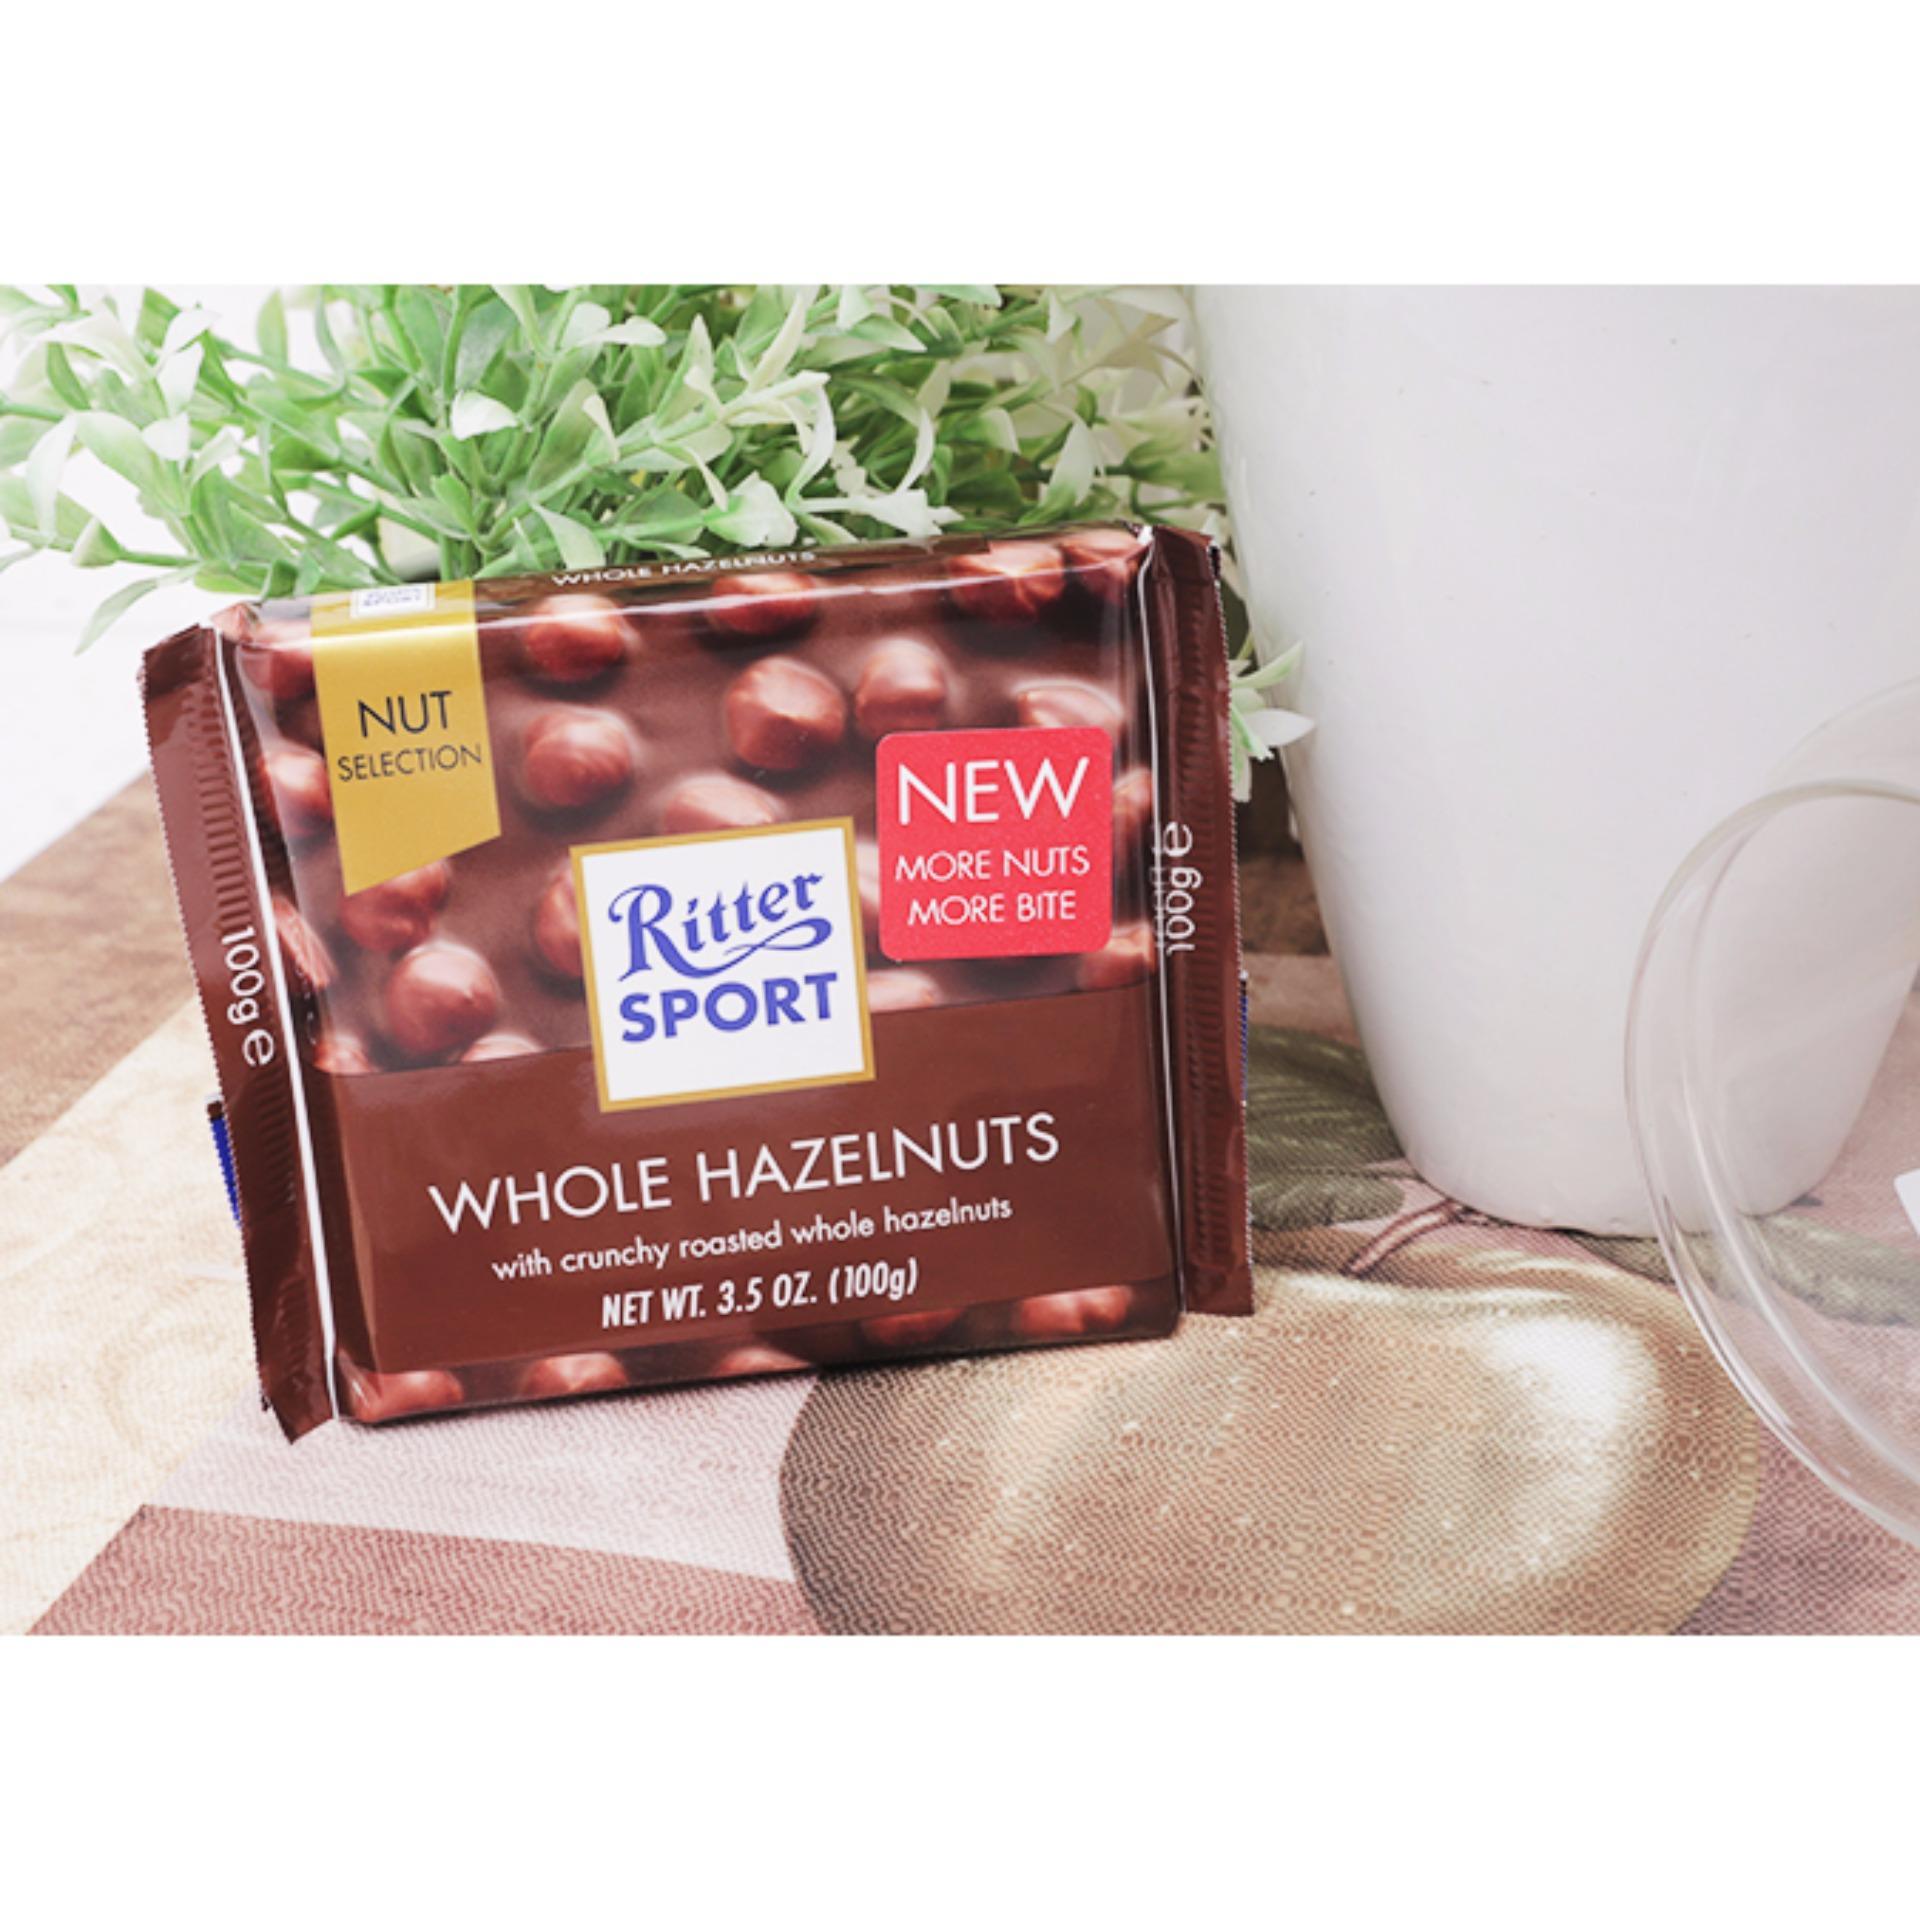 Tư vấn mua Socola Nhân Hạt Dẻ Ritter Sport Whole Hazelnuts 100g